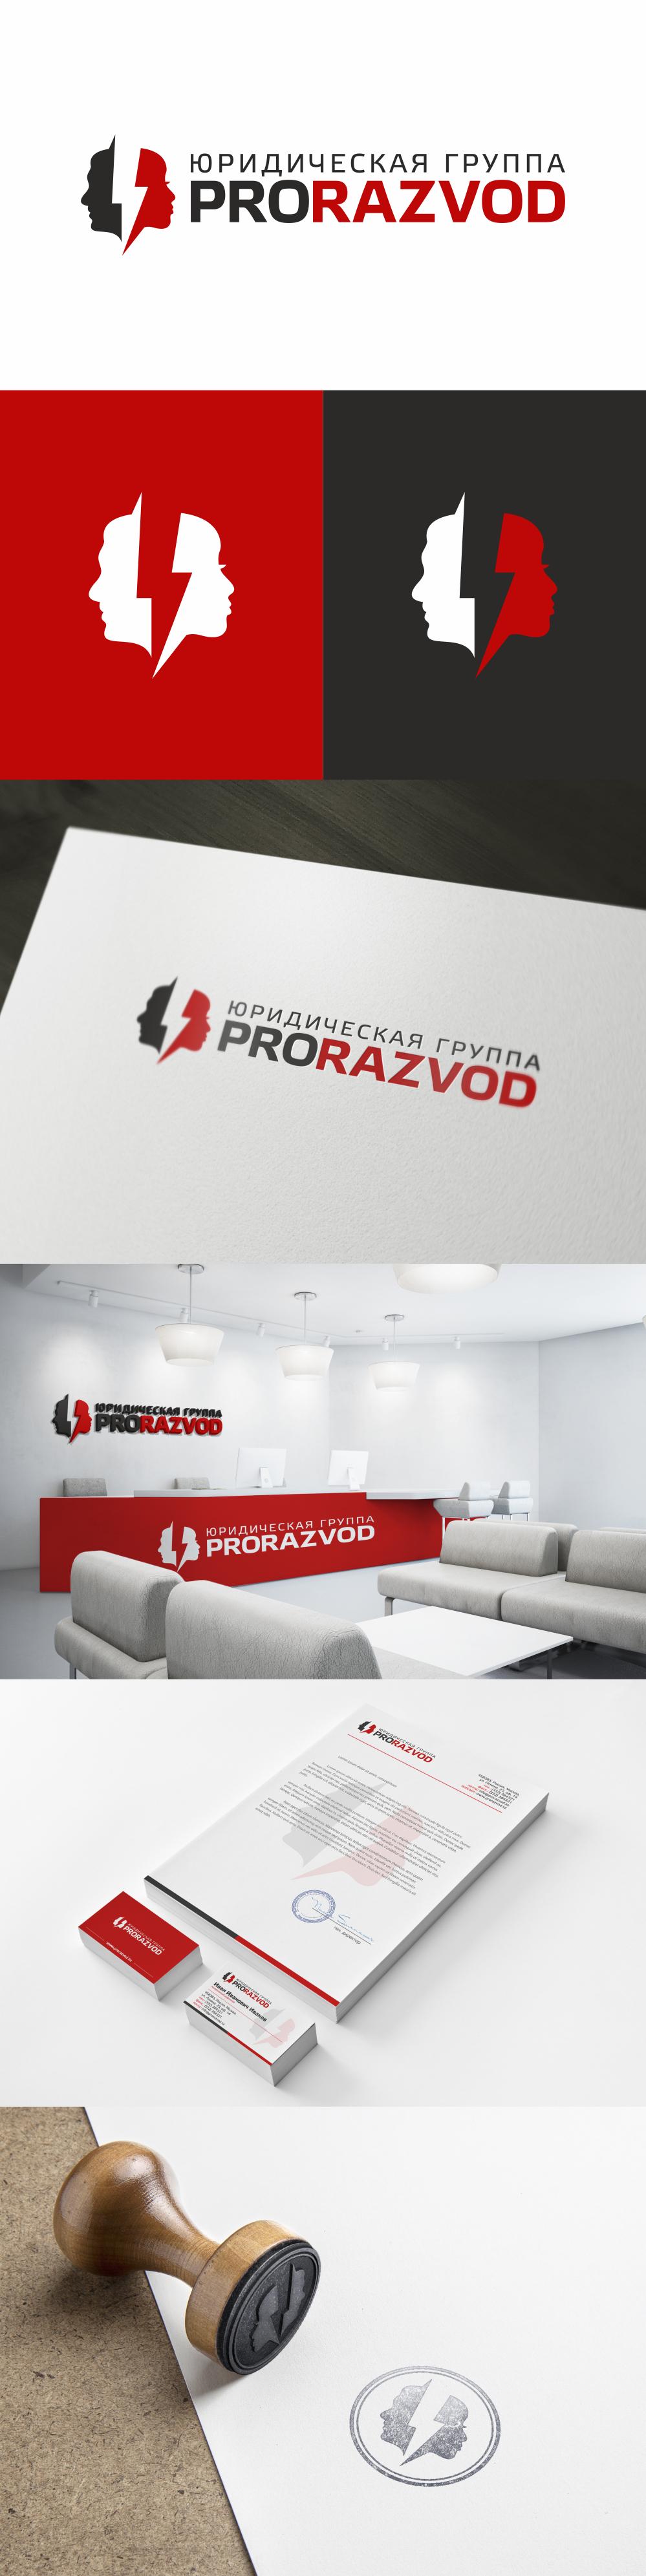 Логотип и фирм стиль для бракоразводного агенства. фото f_76358768cd79e667.jpg